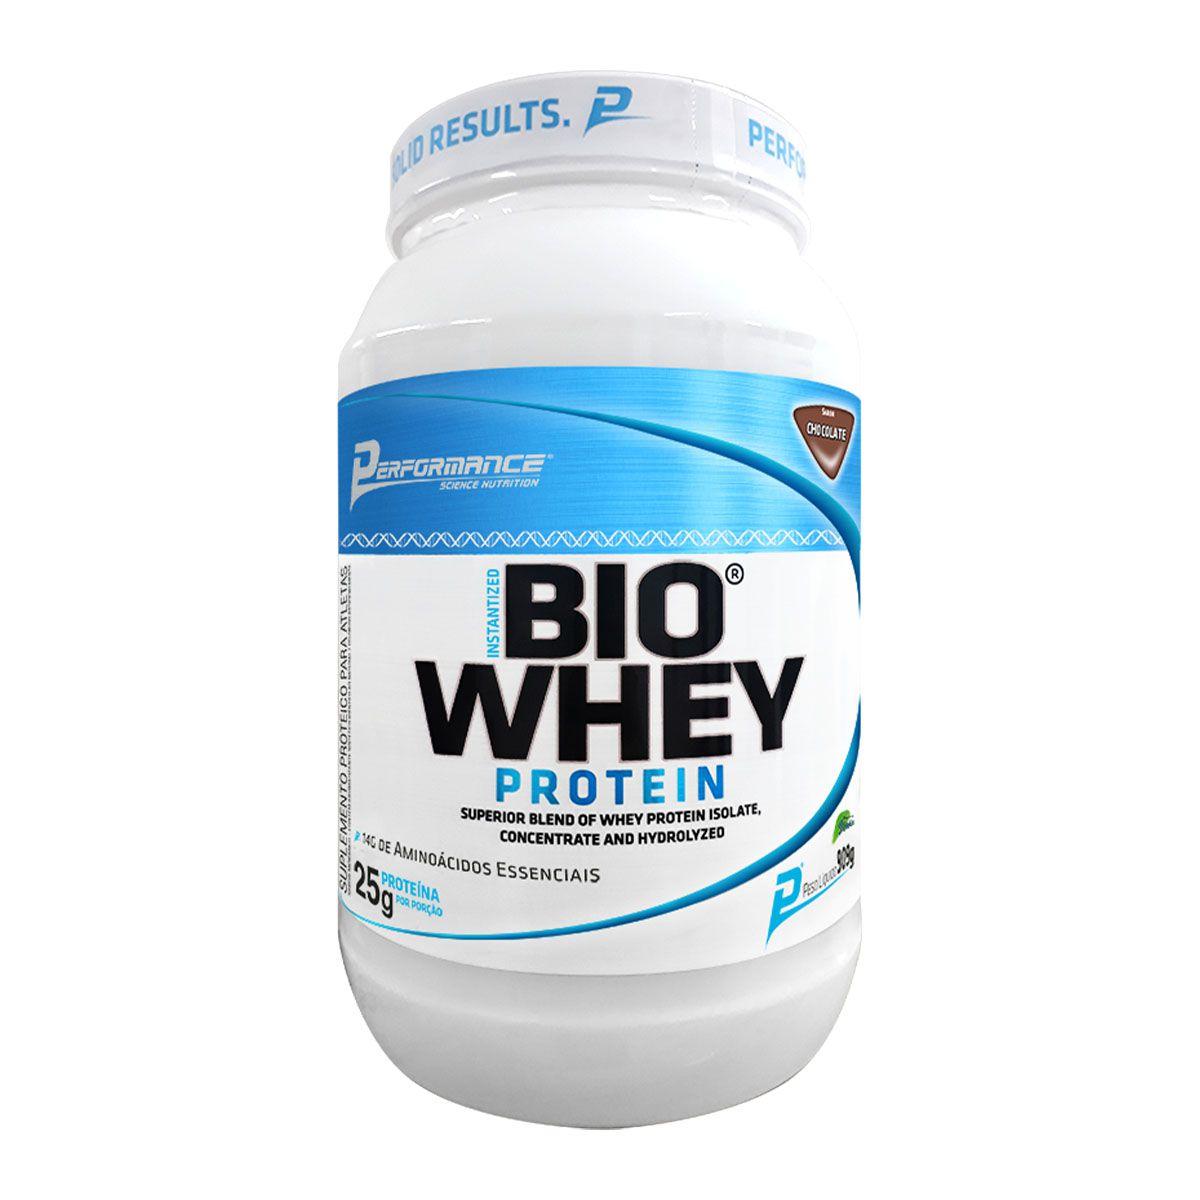 Bio Whey Protein 909g - Performance Nutrition